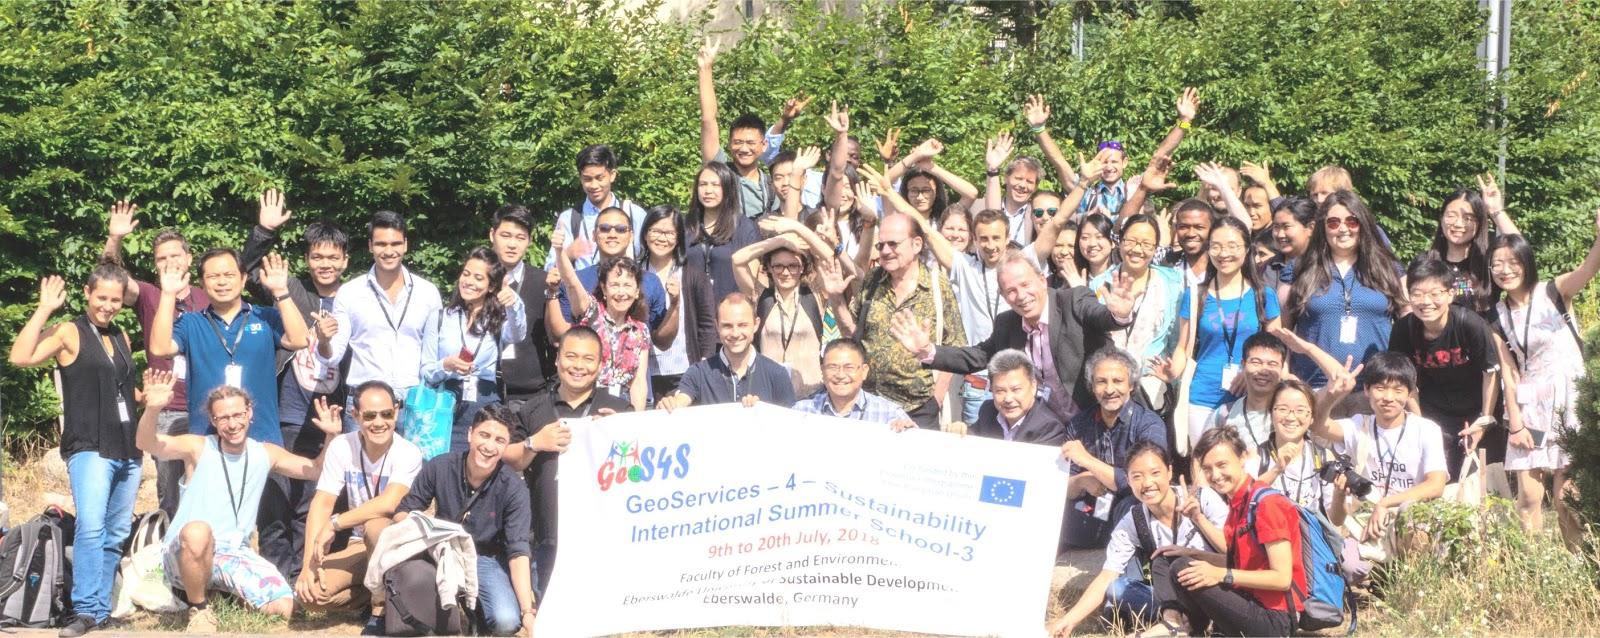 GeoS4S International Summer School-3 in Germany!